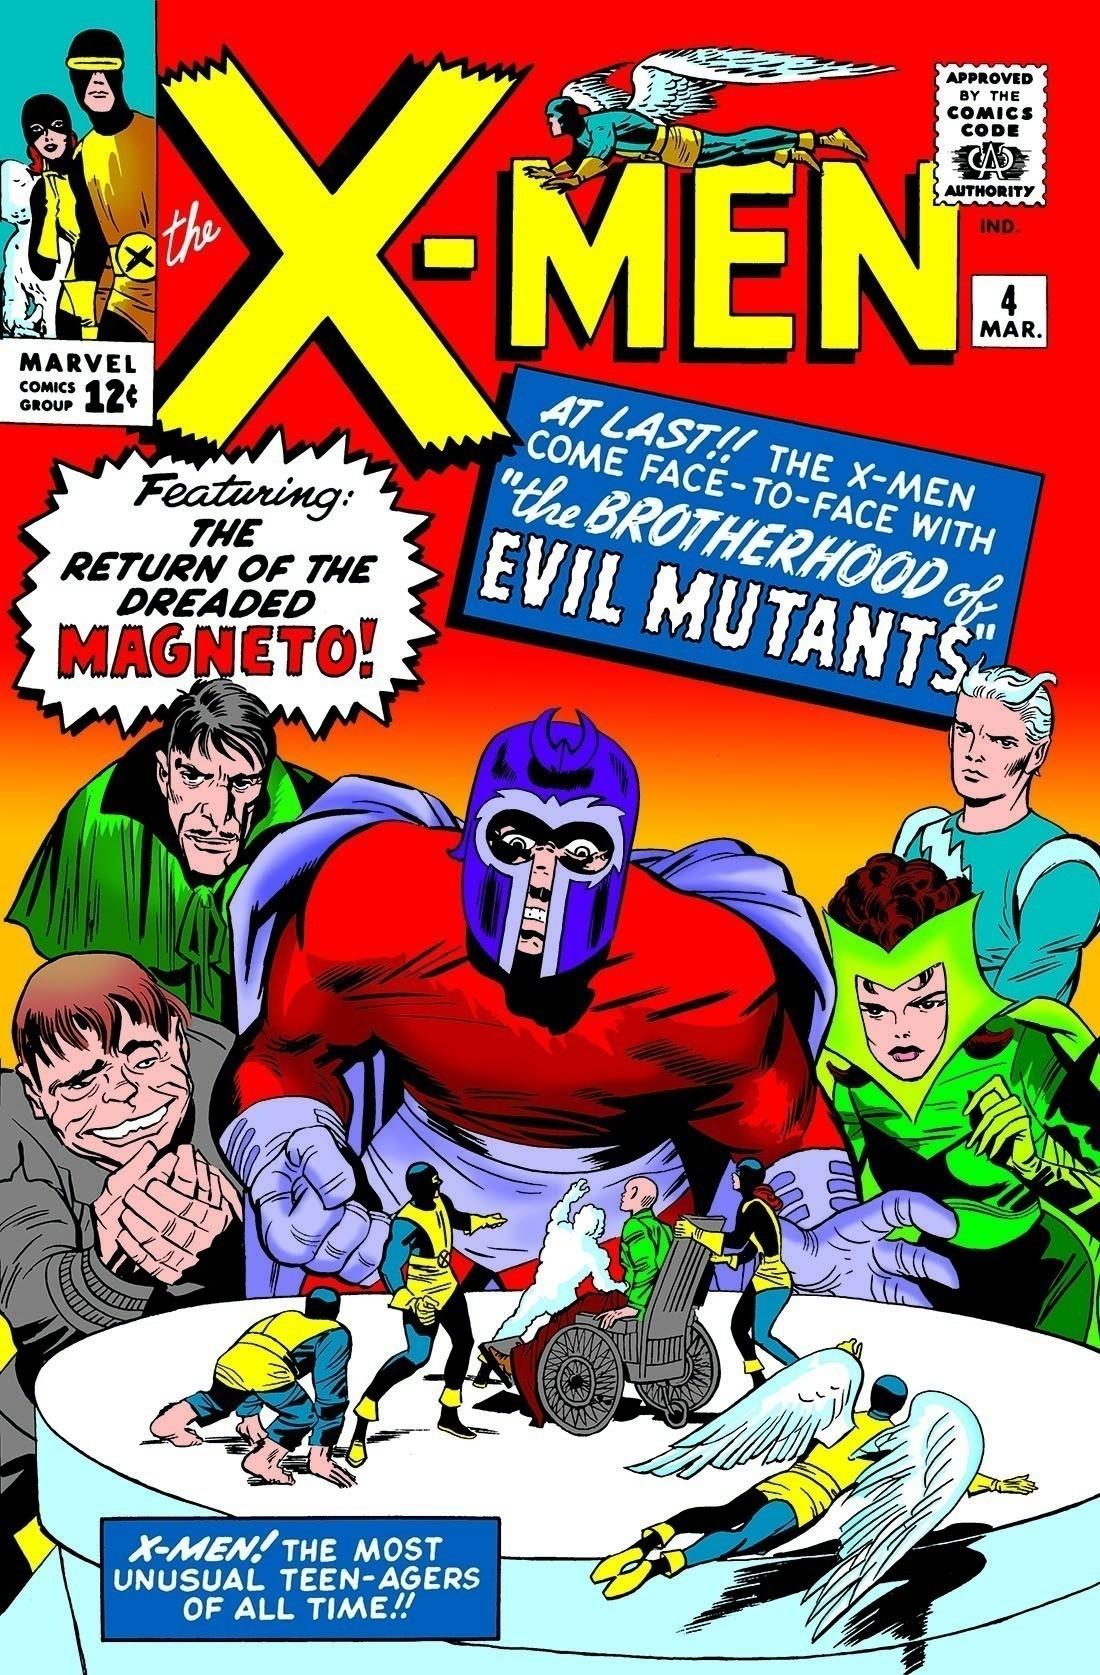 『X-MEN』#4。